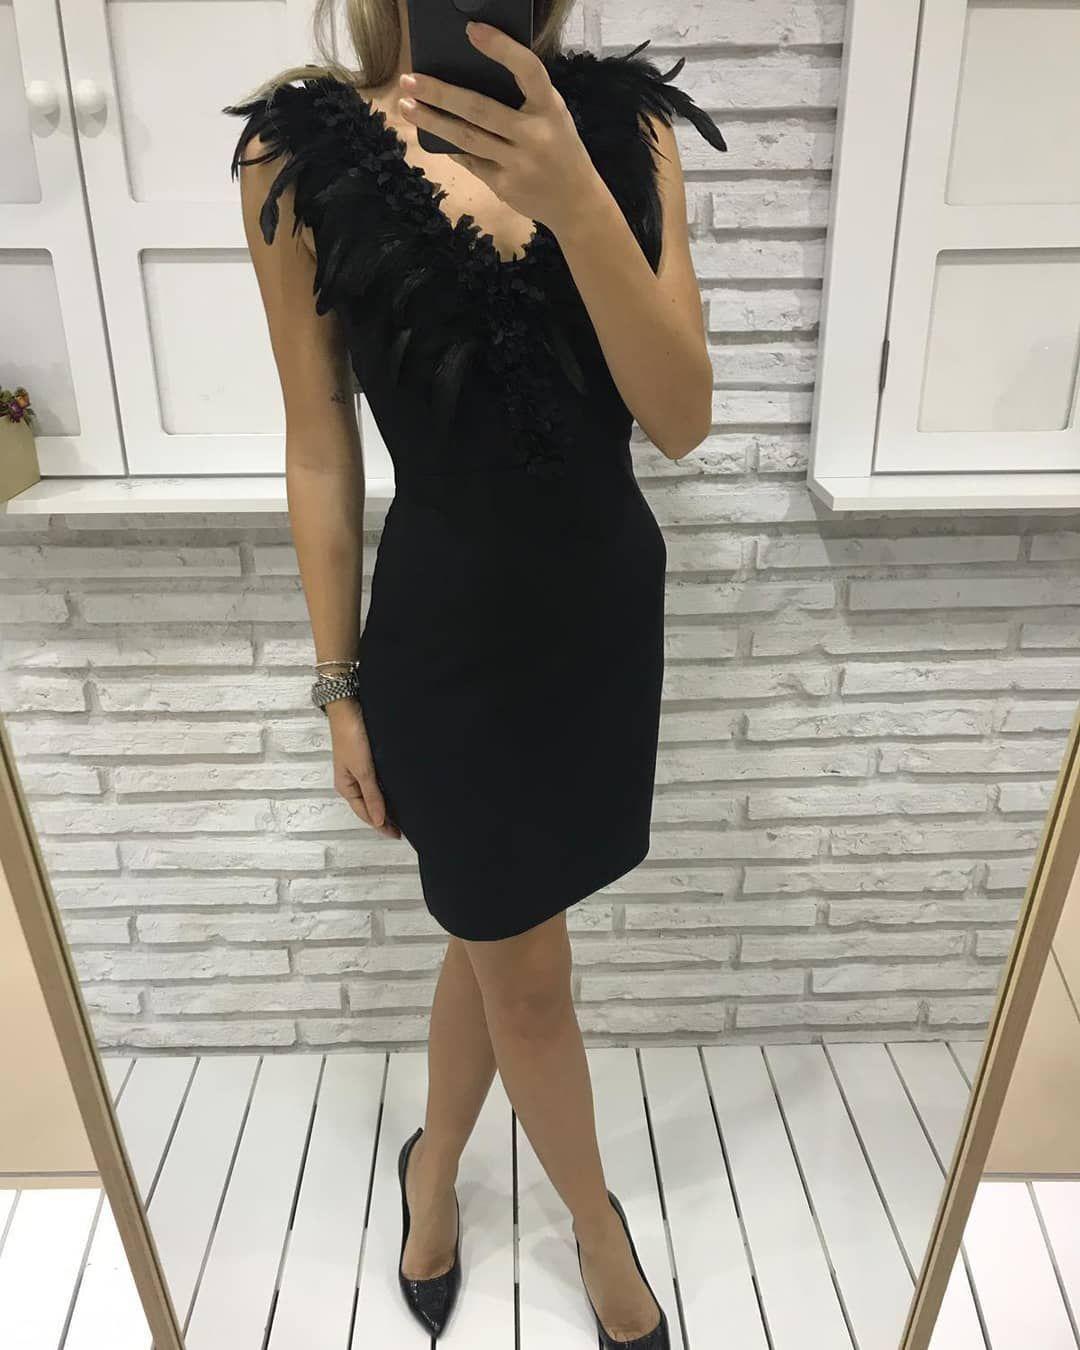 Whosale Toptan Toptan Toptangiyim Bayan Bayangiyim Alisveris Merter Mertertoptan Gungorentoptan Shoppingonline Indirim Elbise Moda Moda Elbise Sal